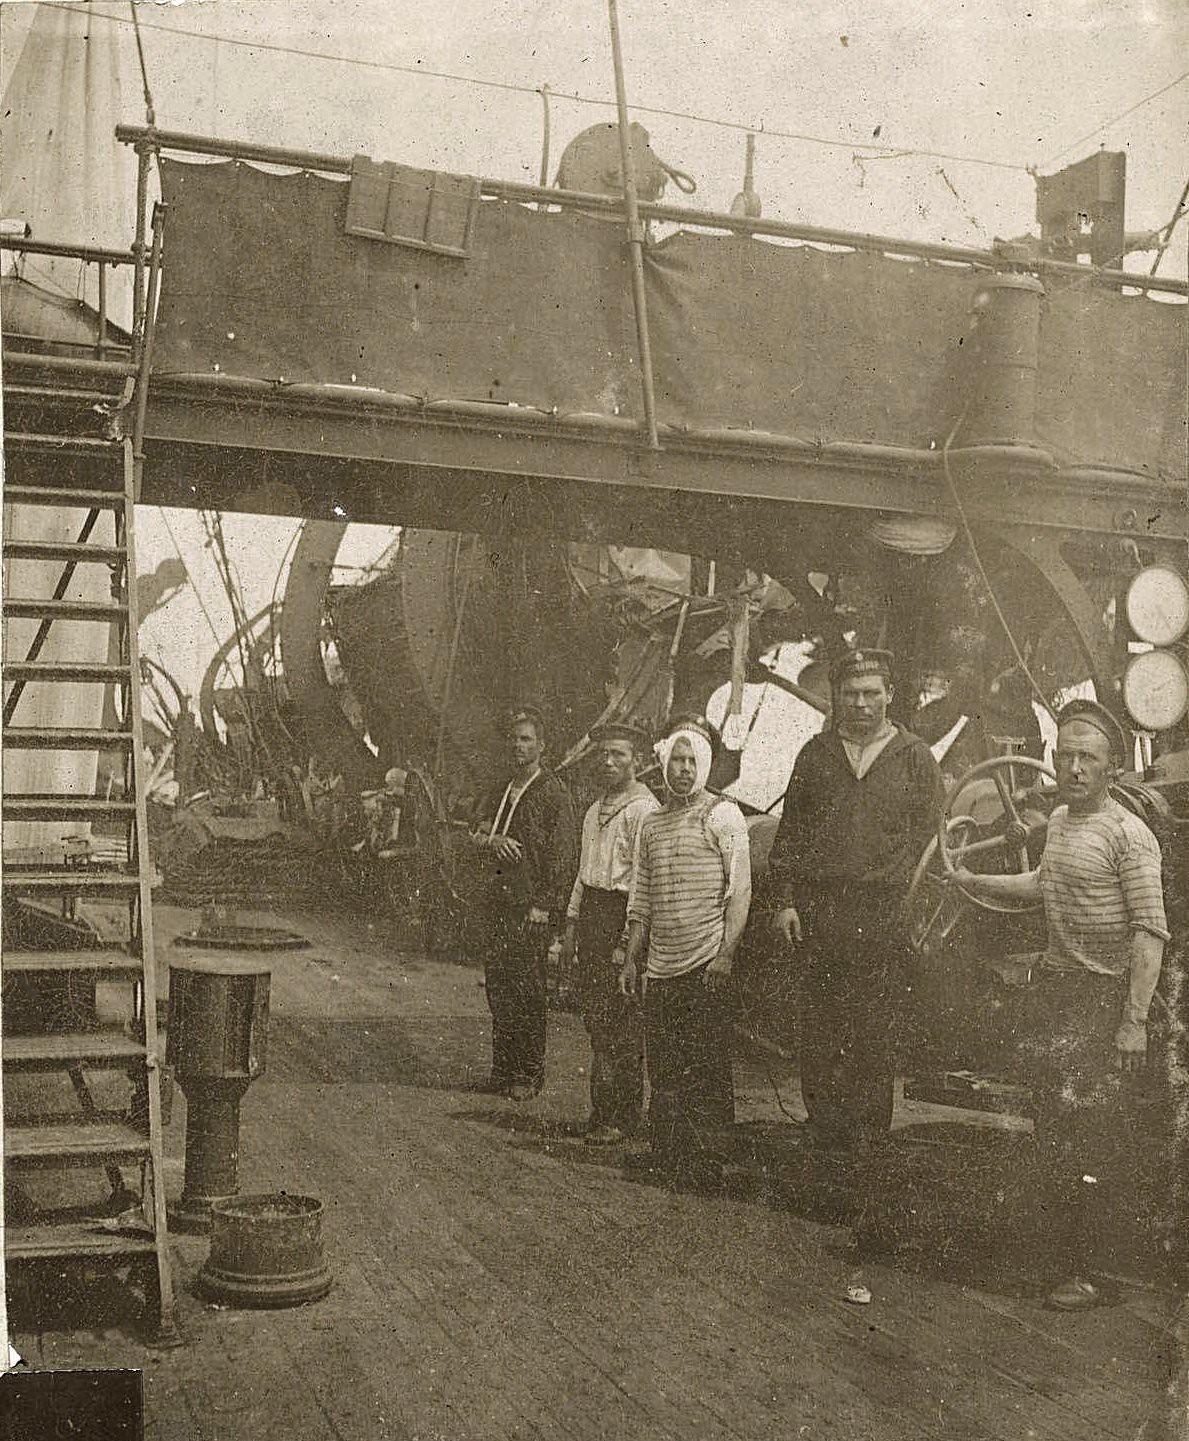 Моряки на палубе корабля